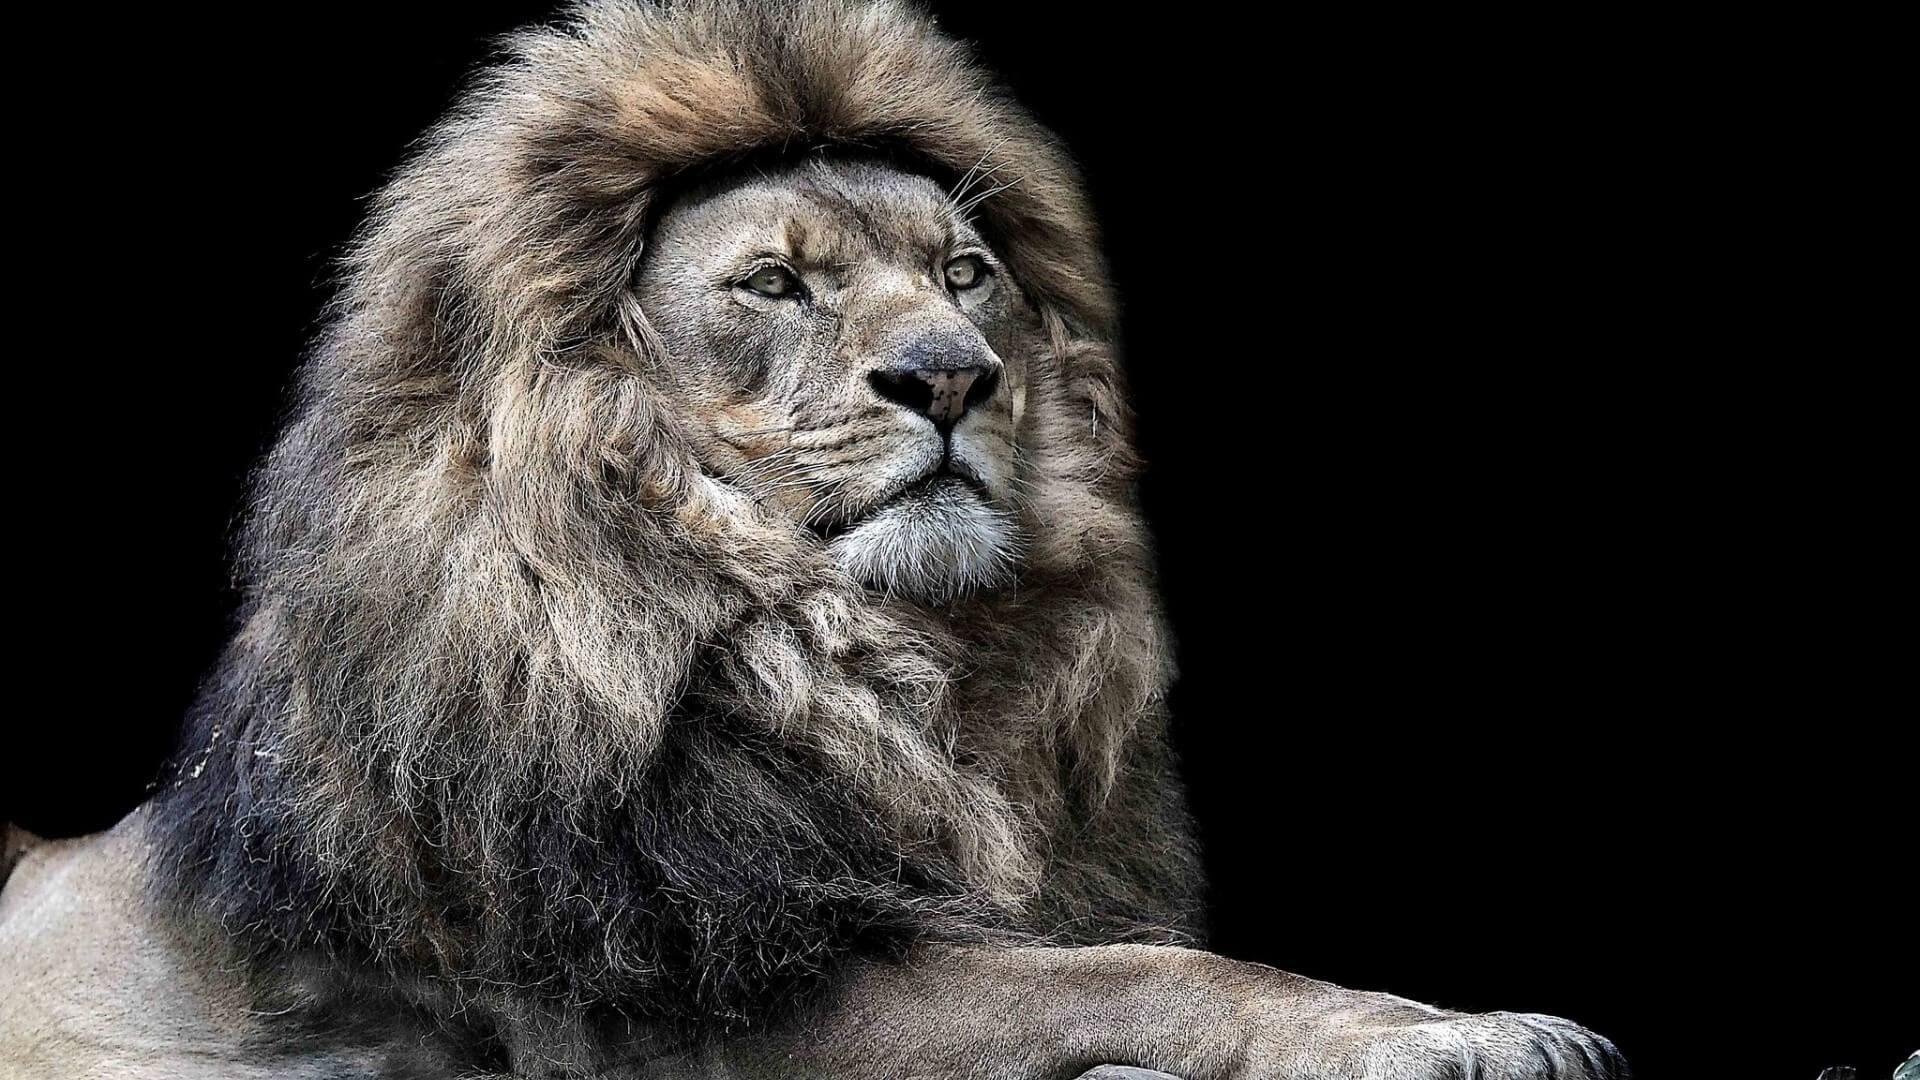 lion free computer wallpaper download